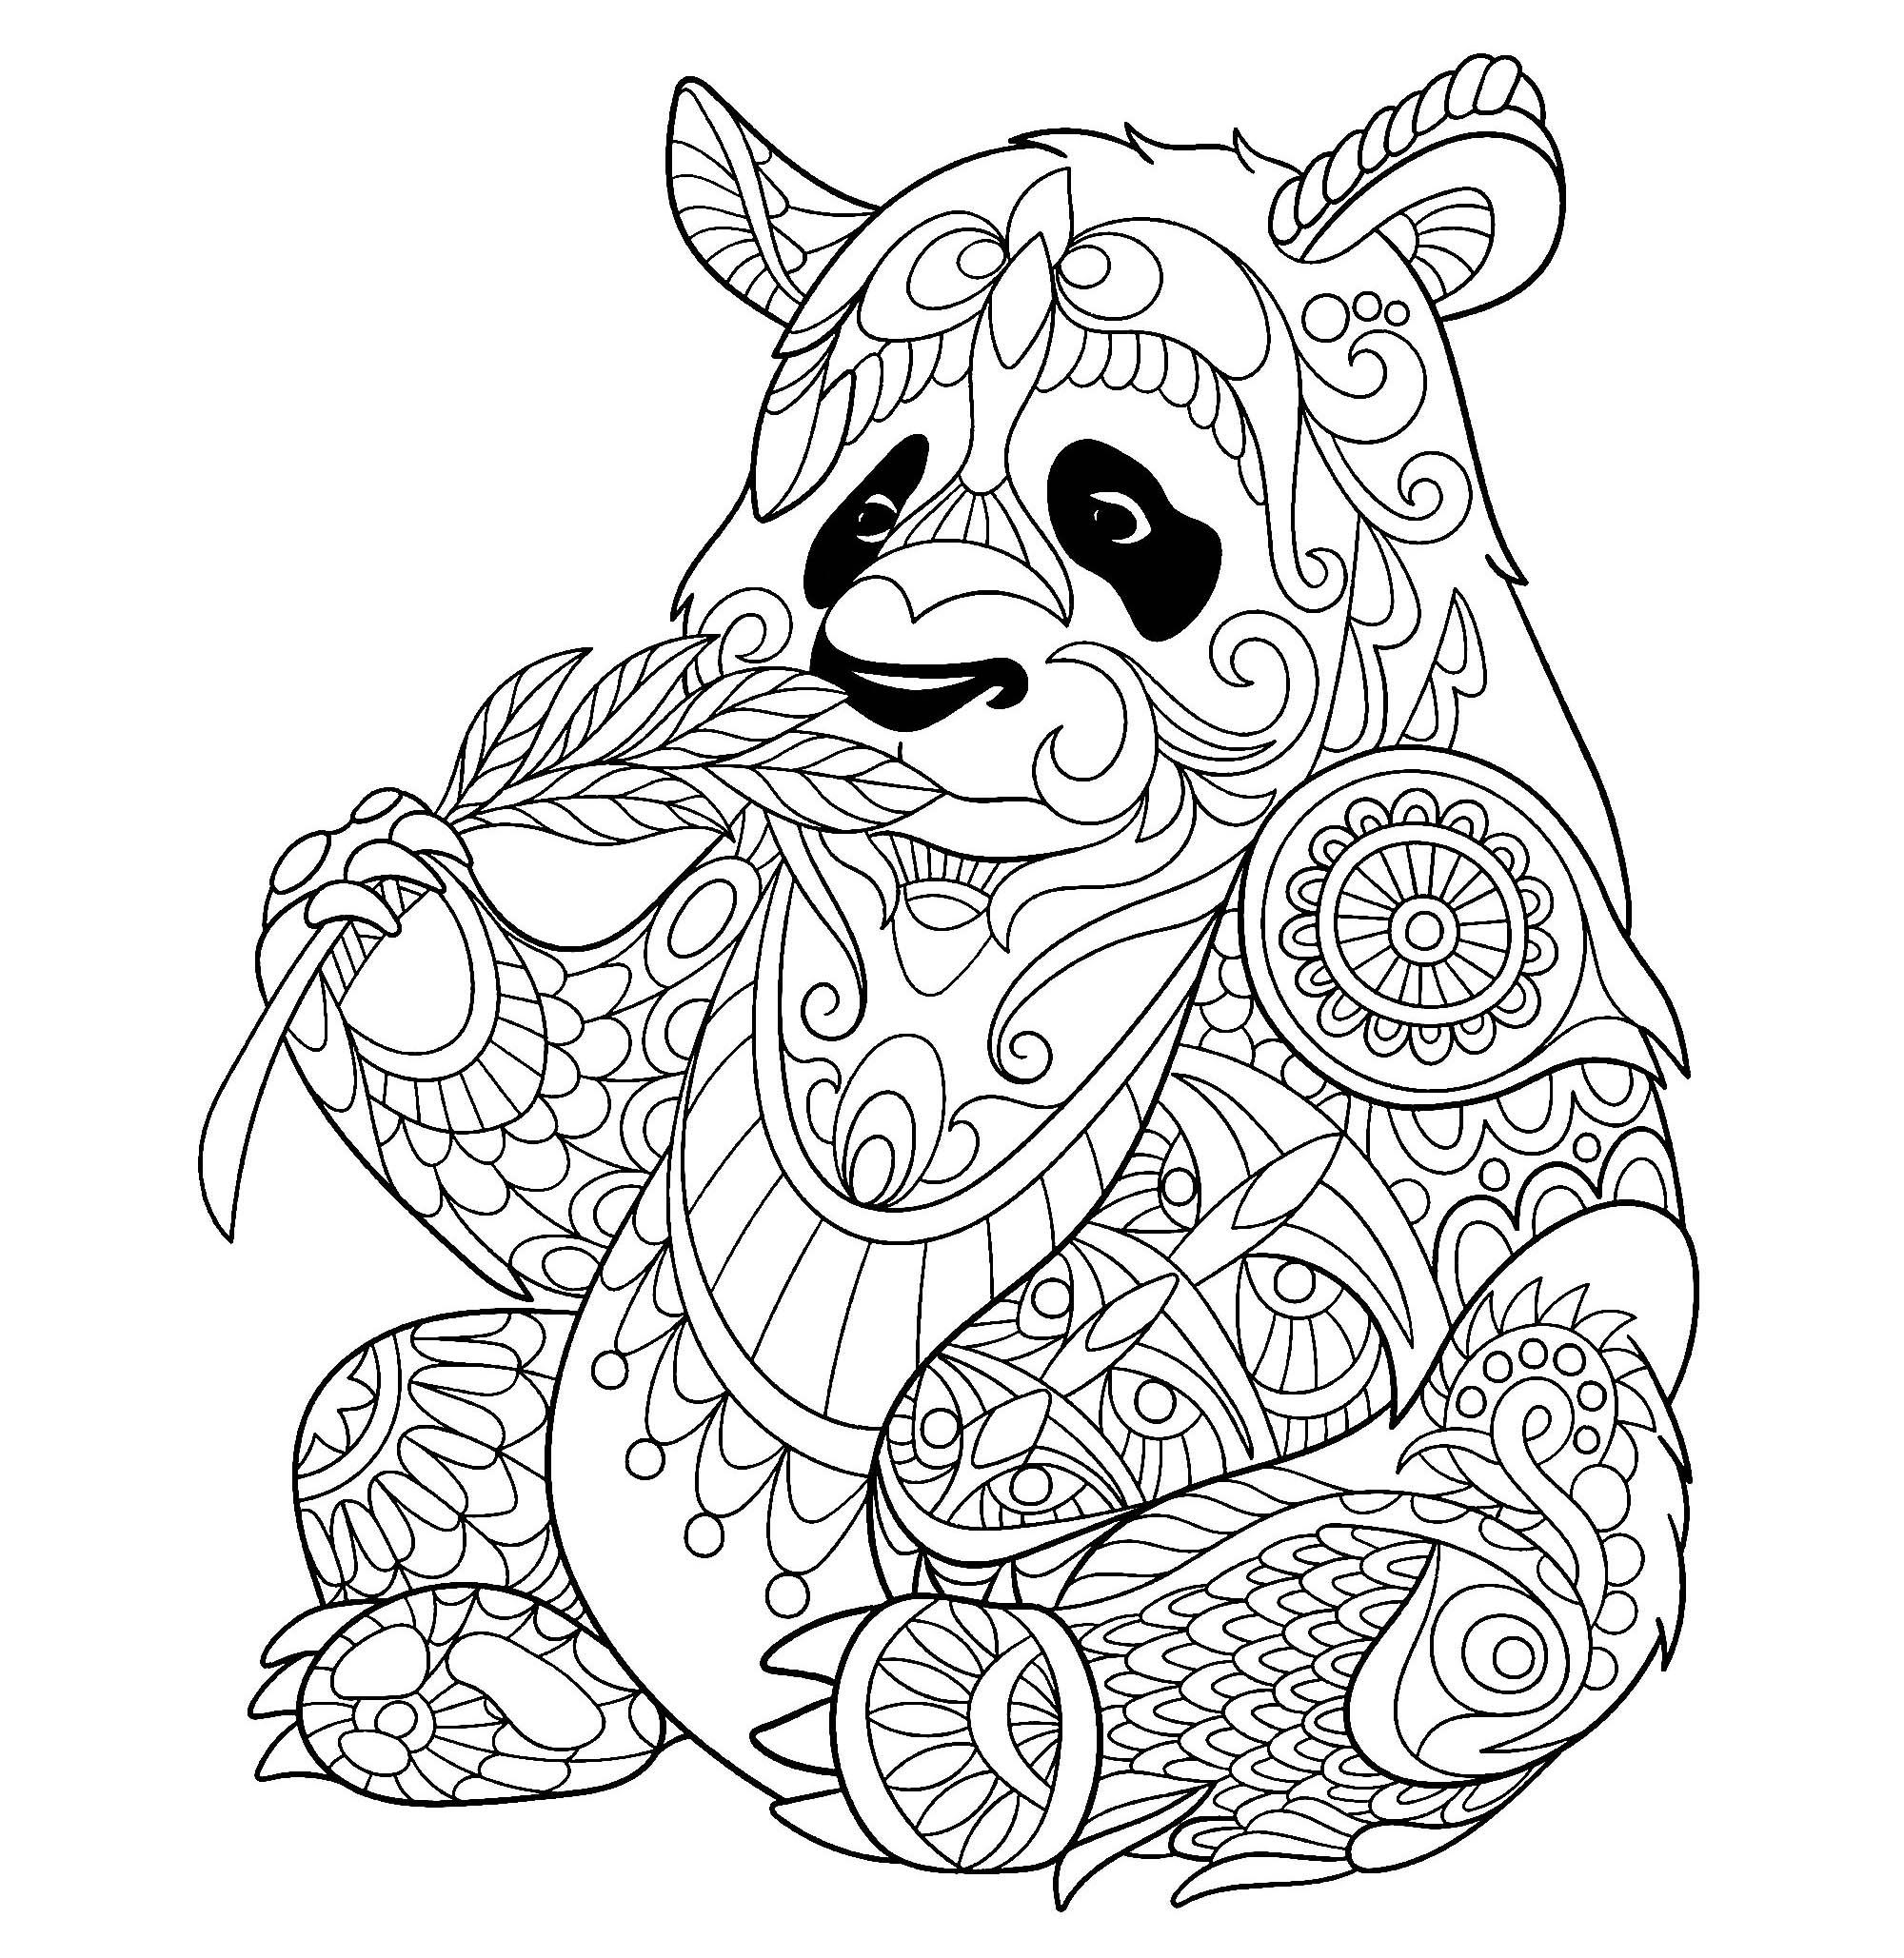 Panda 80543 panda disegni da colorare per adulti - Pagine da colorare pesci per adulti ...